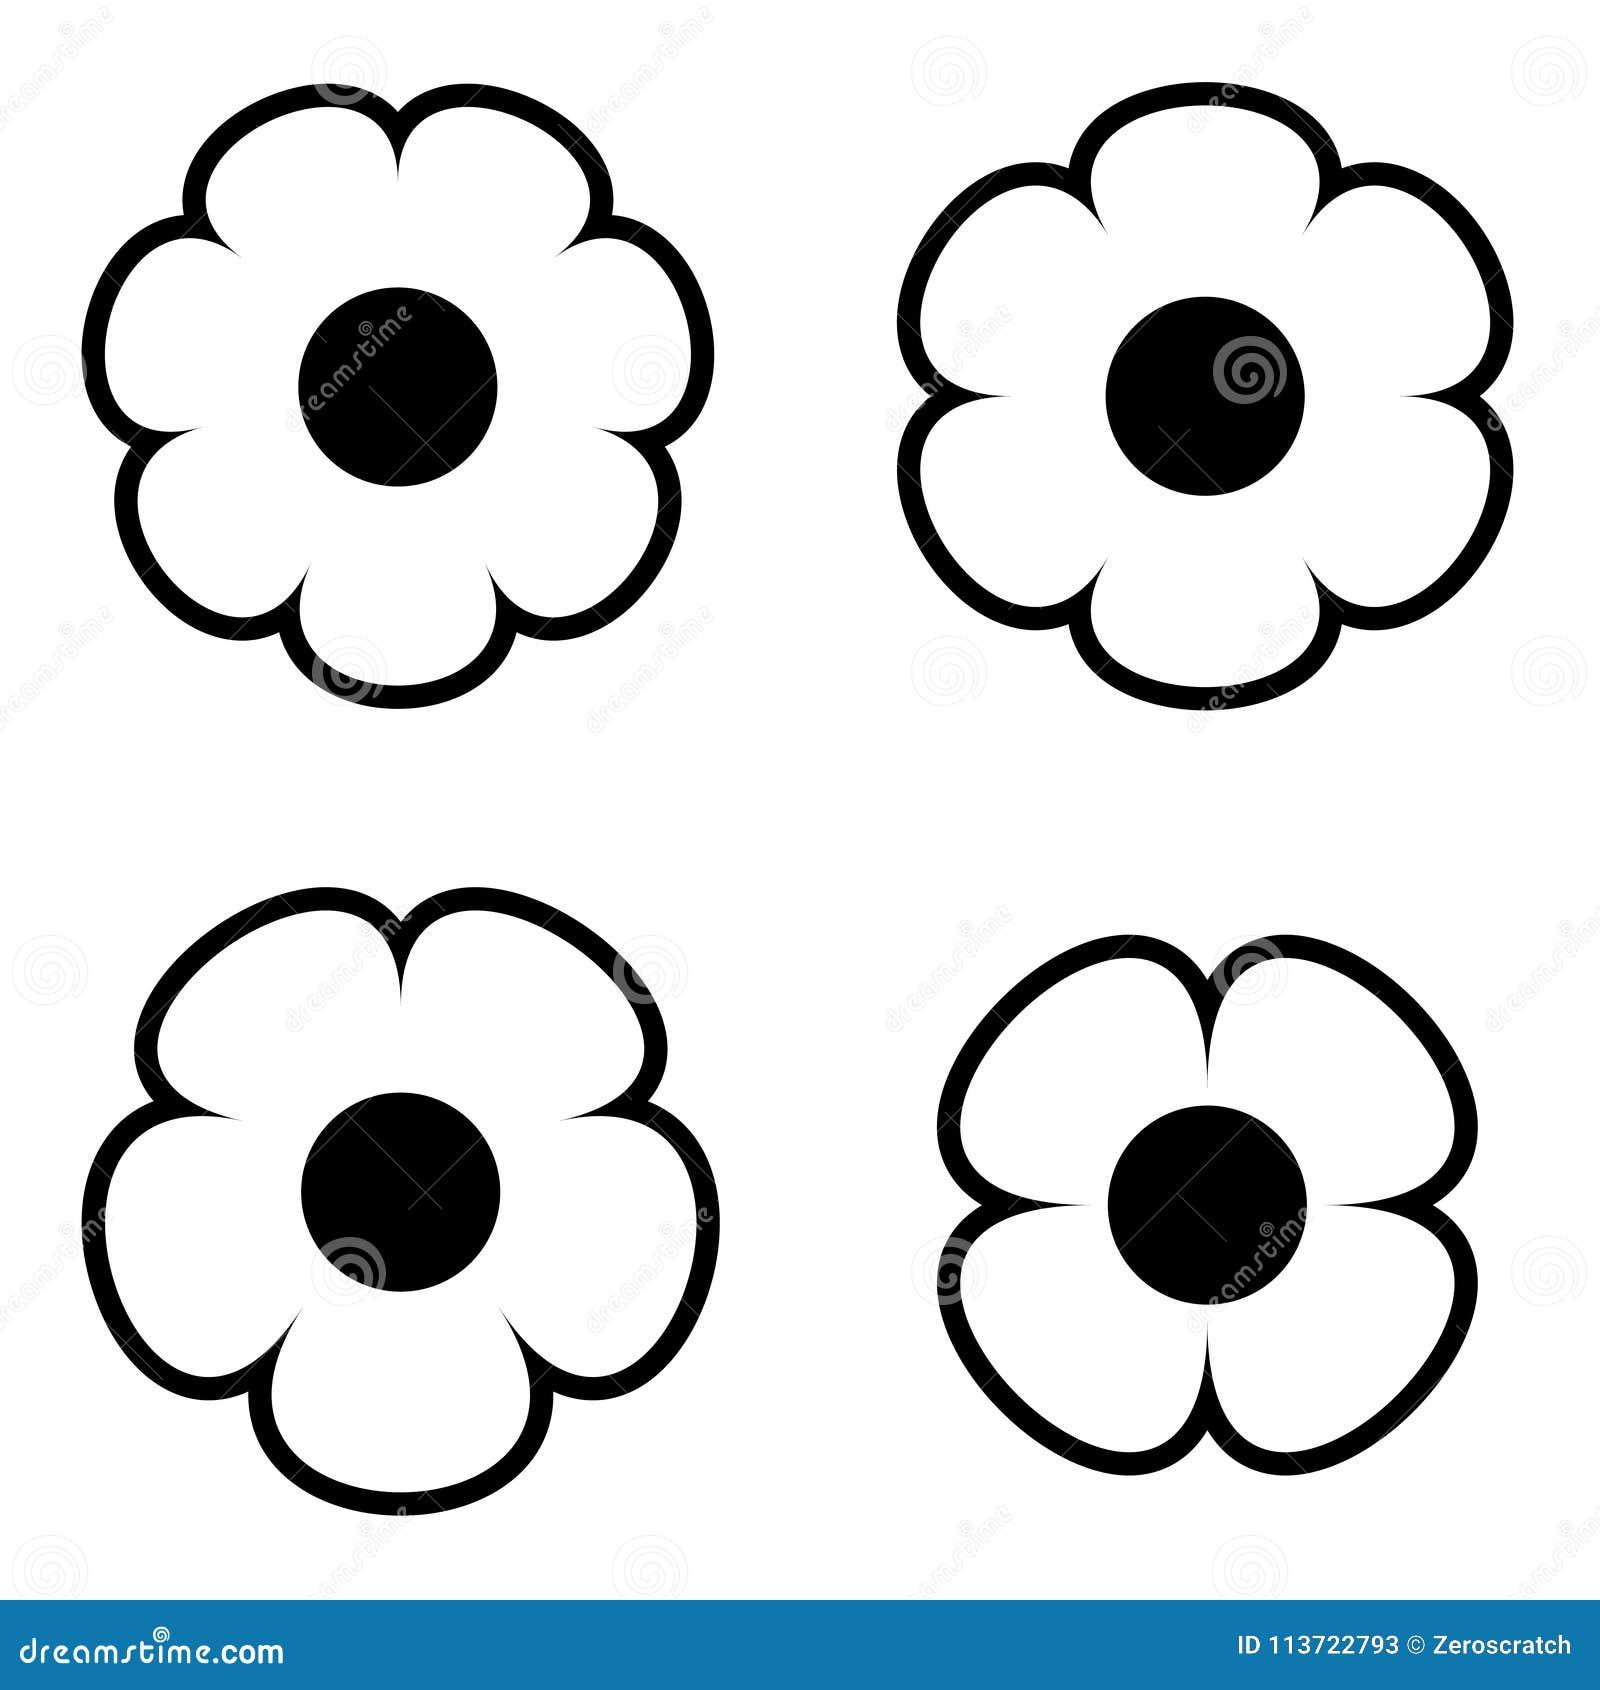 Simple black and white flower icon symbol logo set stock vector download simple black and white flower icon symbol logo set stock vector illustration of elements mightylinksfo